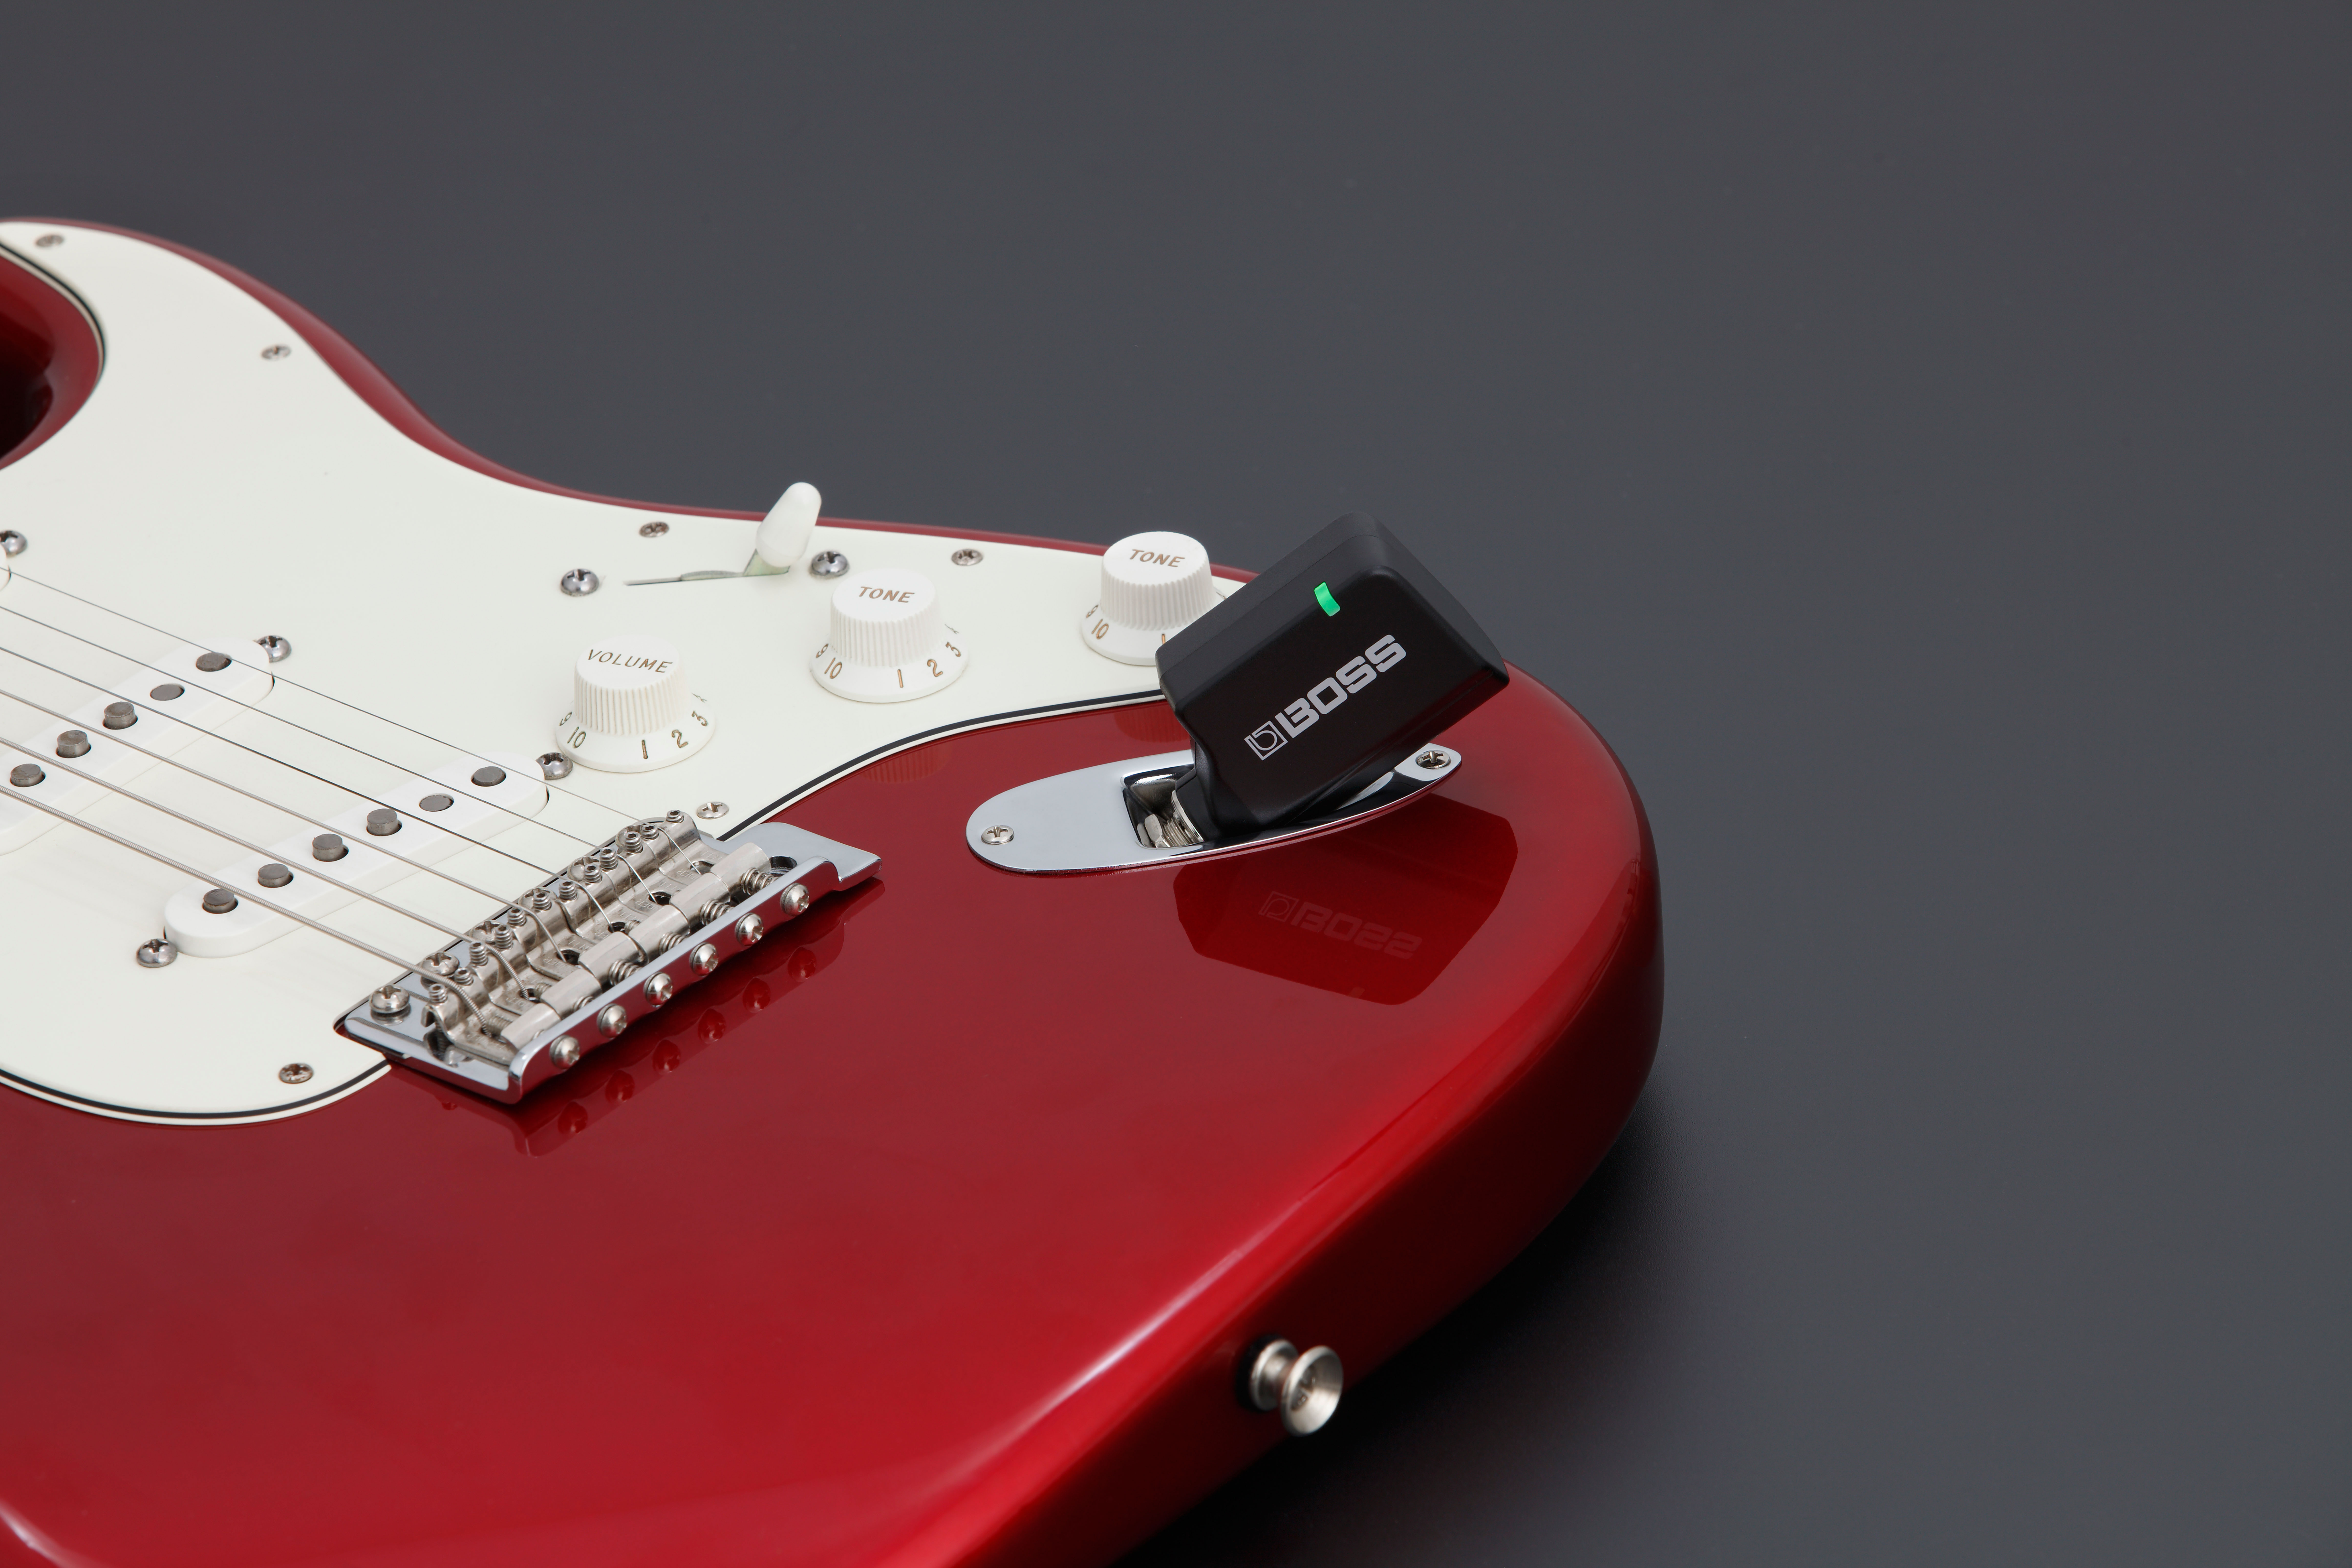 Boss ボス KATANA-AIR 完全ワイヤレス・ギターアンプ KATANA KTN-AIR